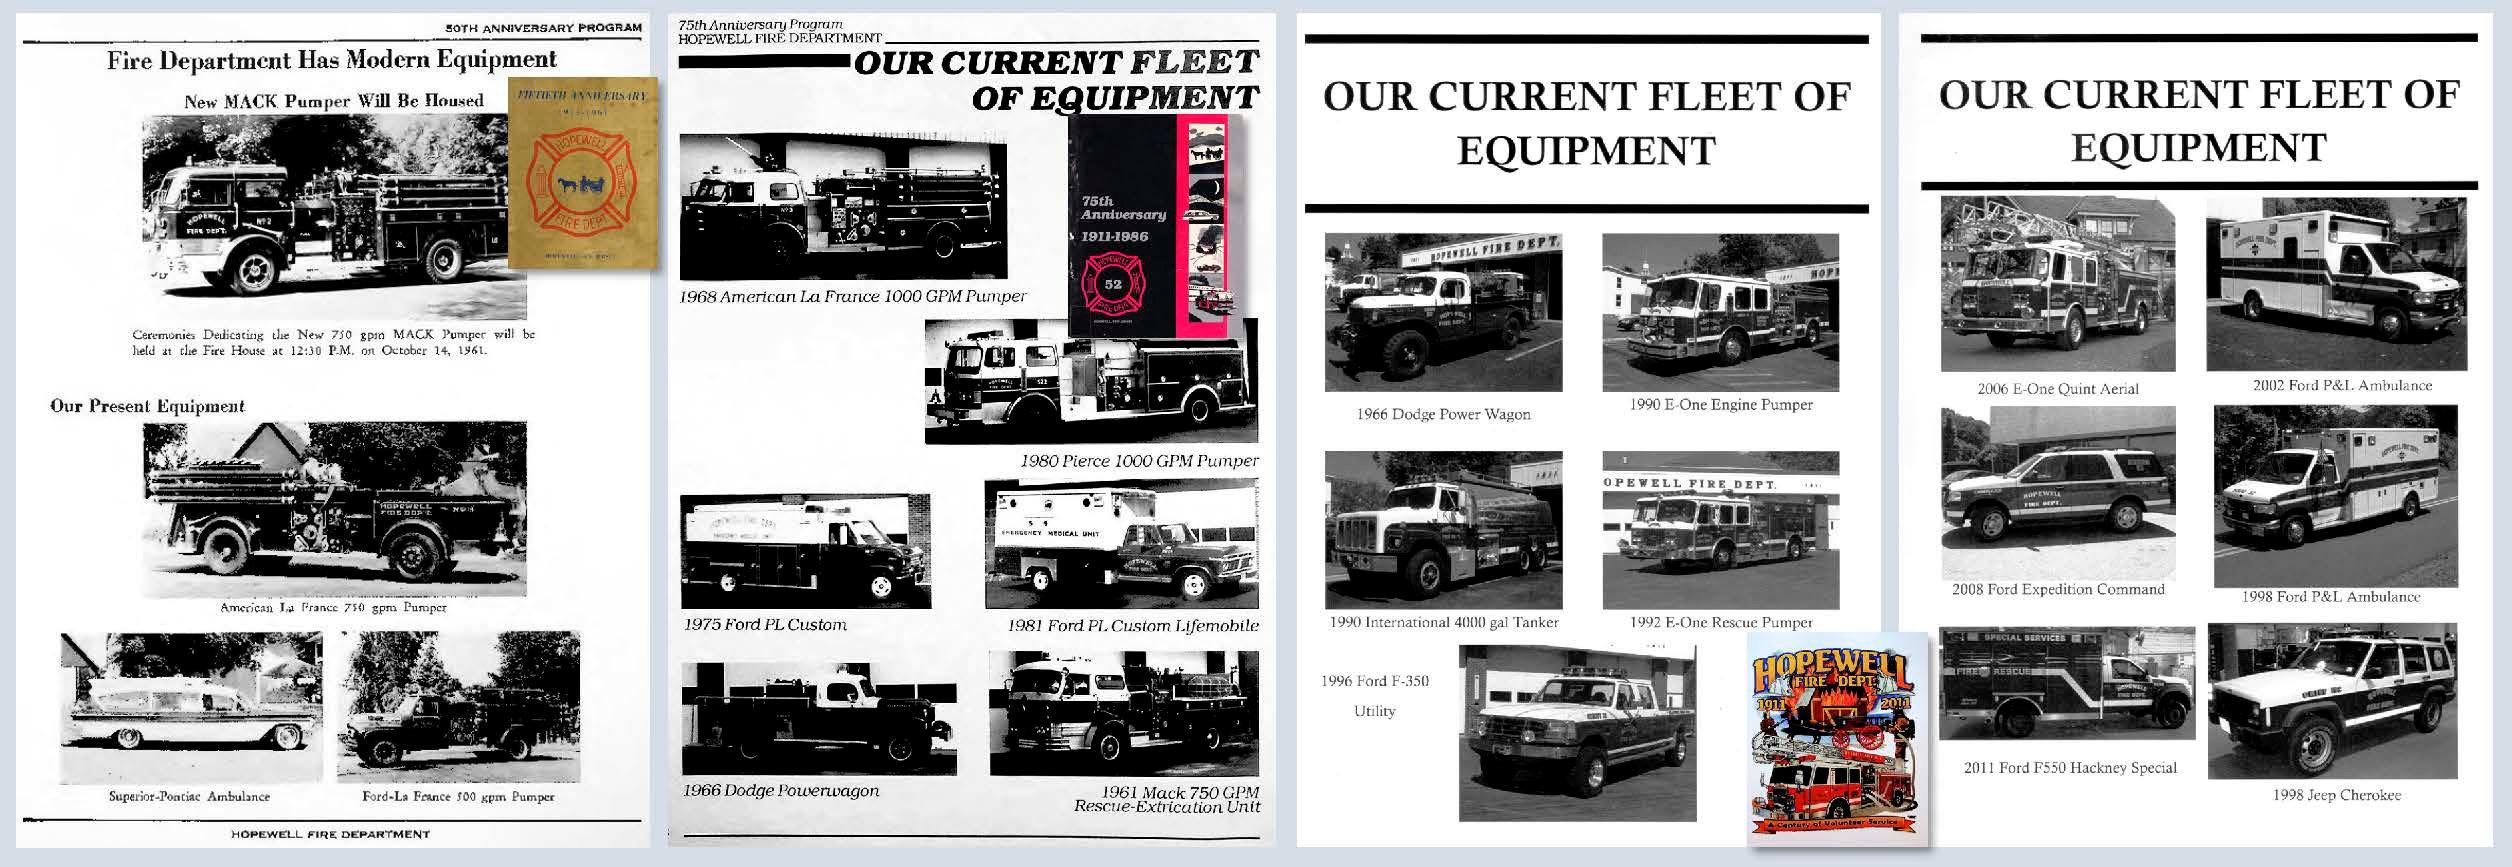 https://i0.wp.com/hopewellhistoryproject.org/wp-content/uploads/2020/10/HwBoro-Fire-Dept-Equipment-H.jpg?ssl=1